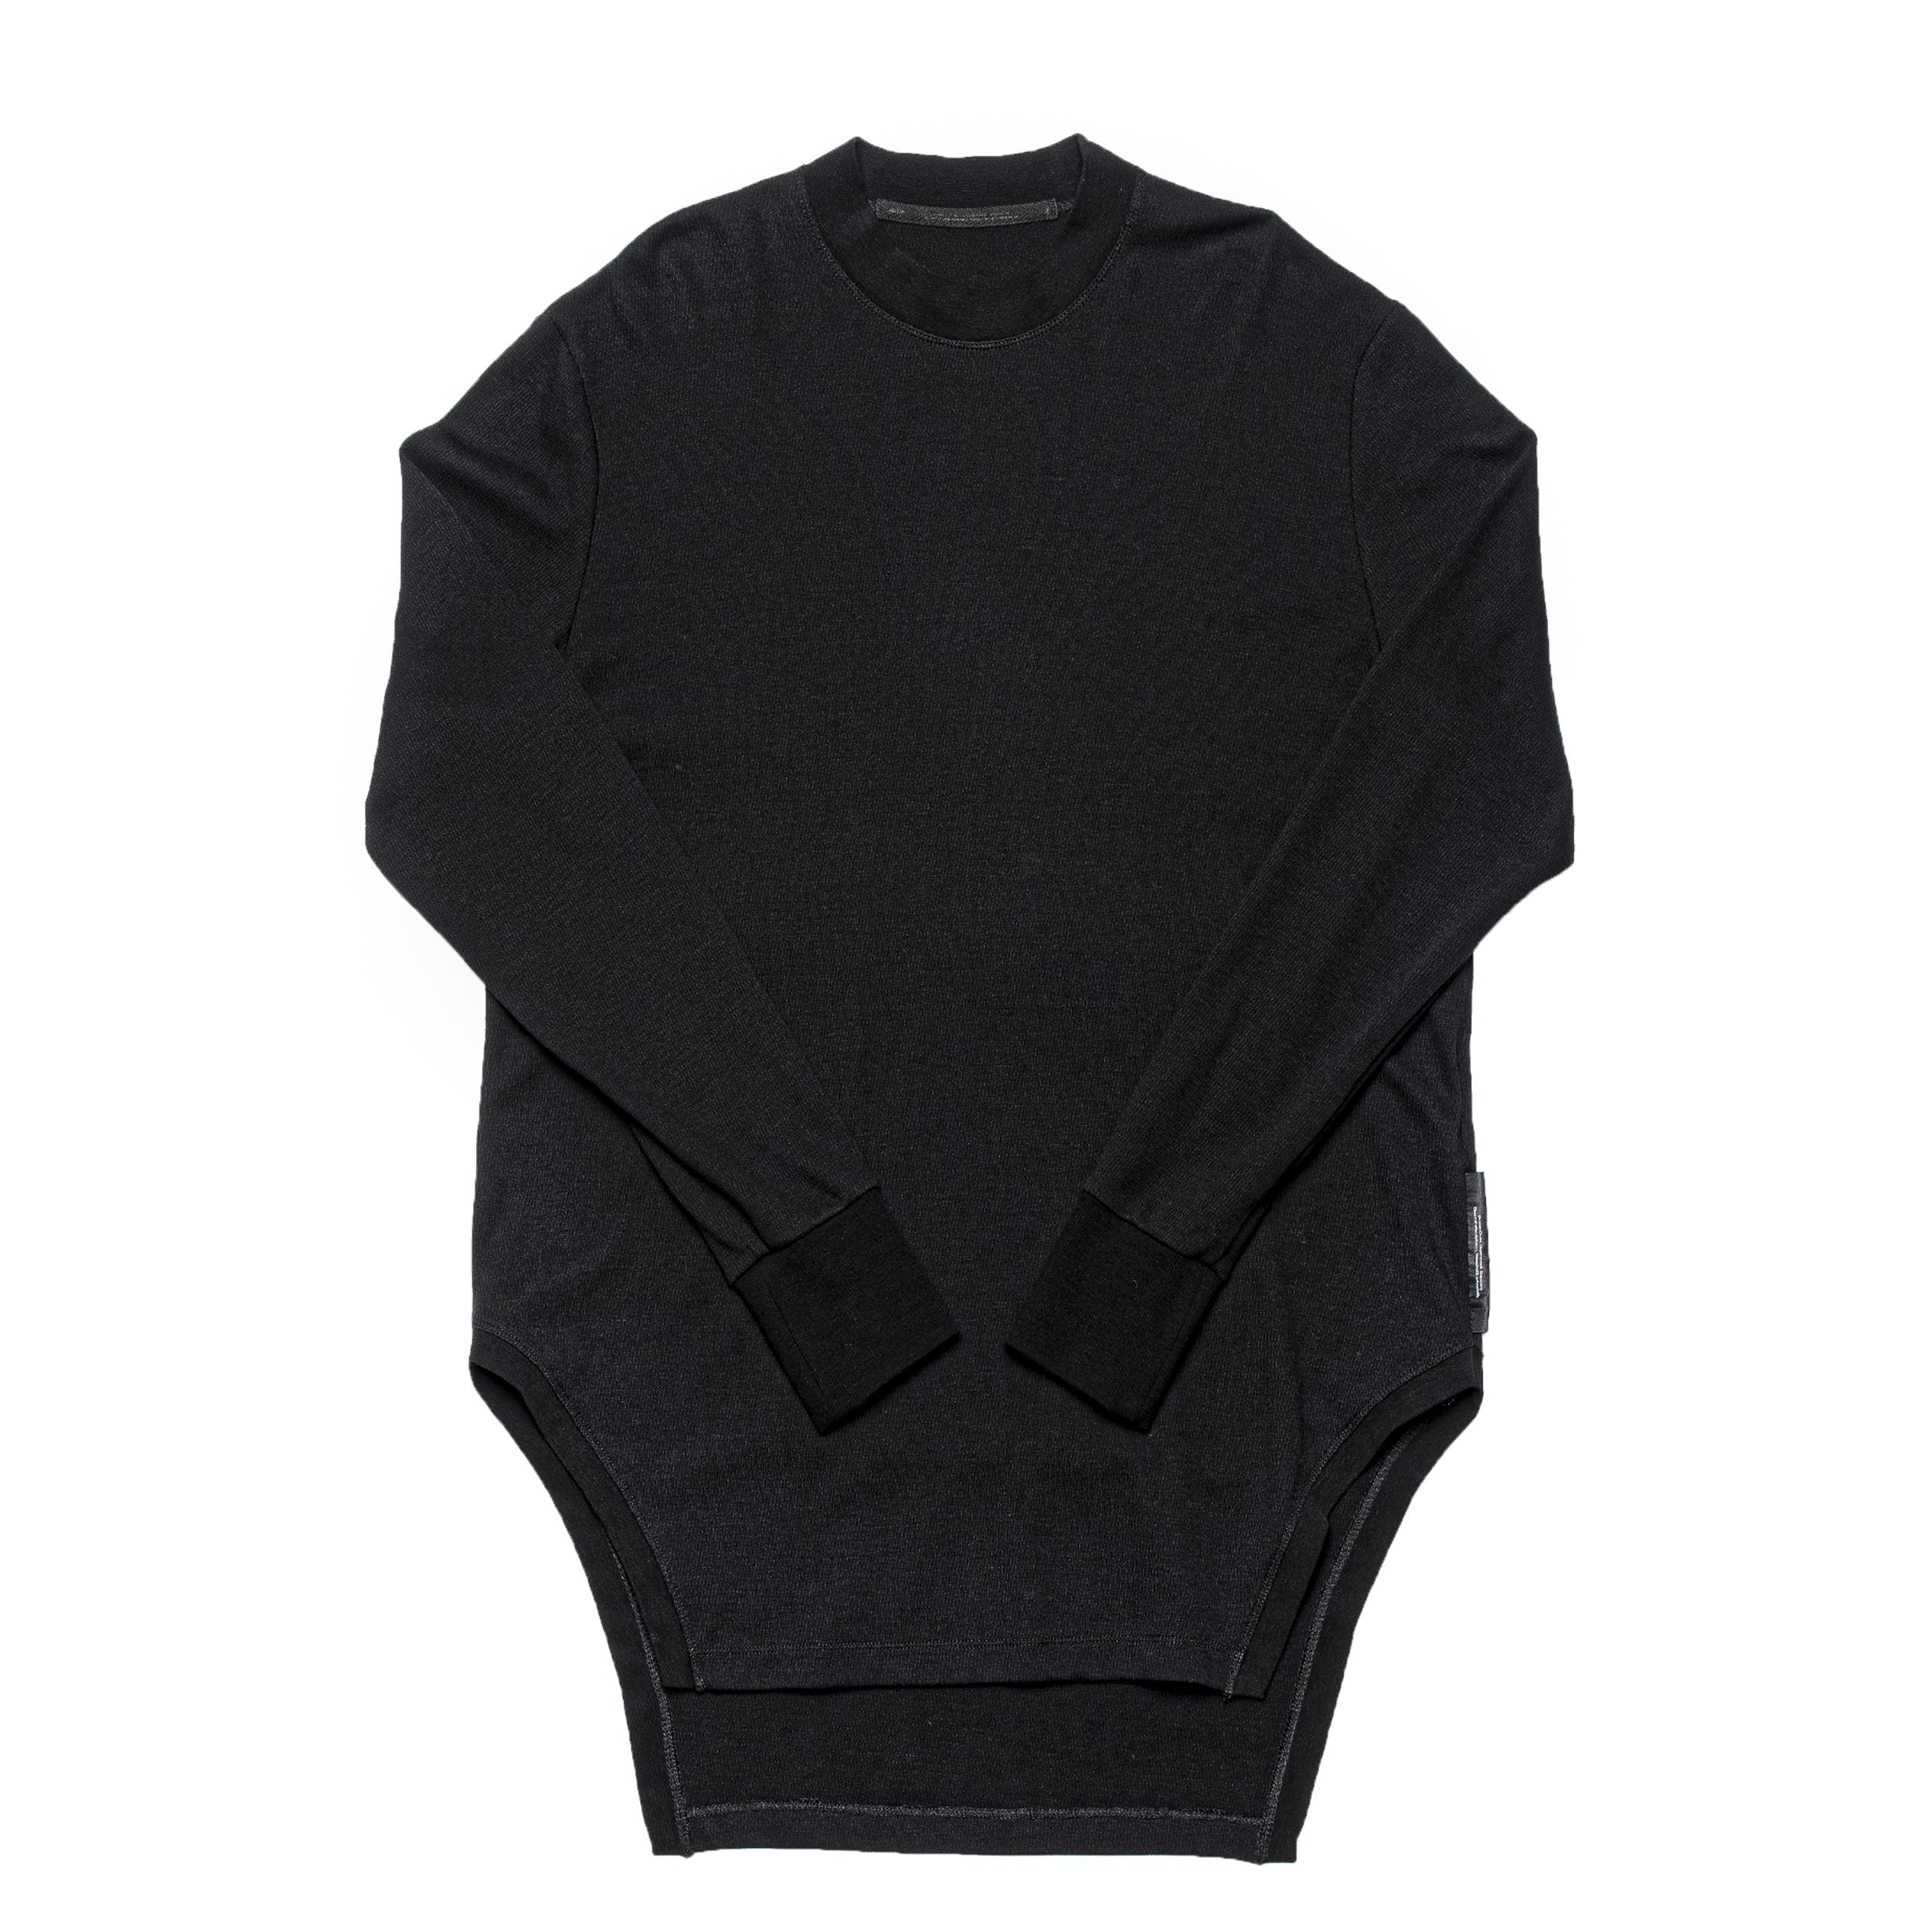 687CUM12-BLACK / フレイムドヘムシャツ